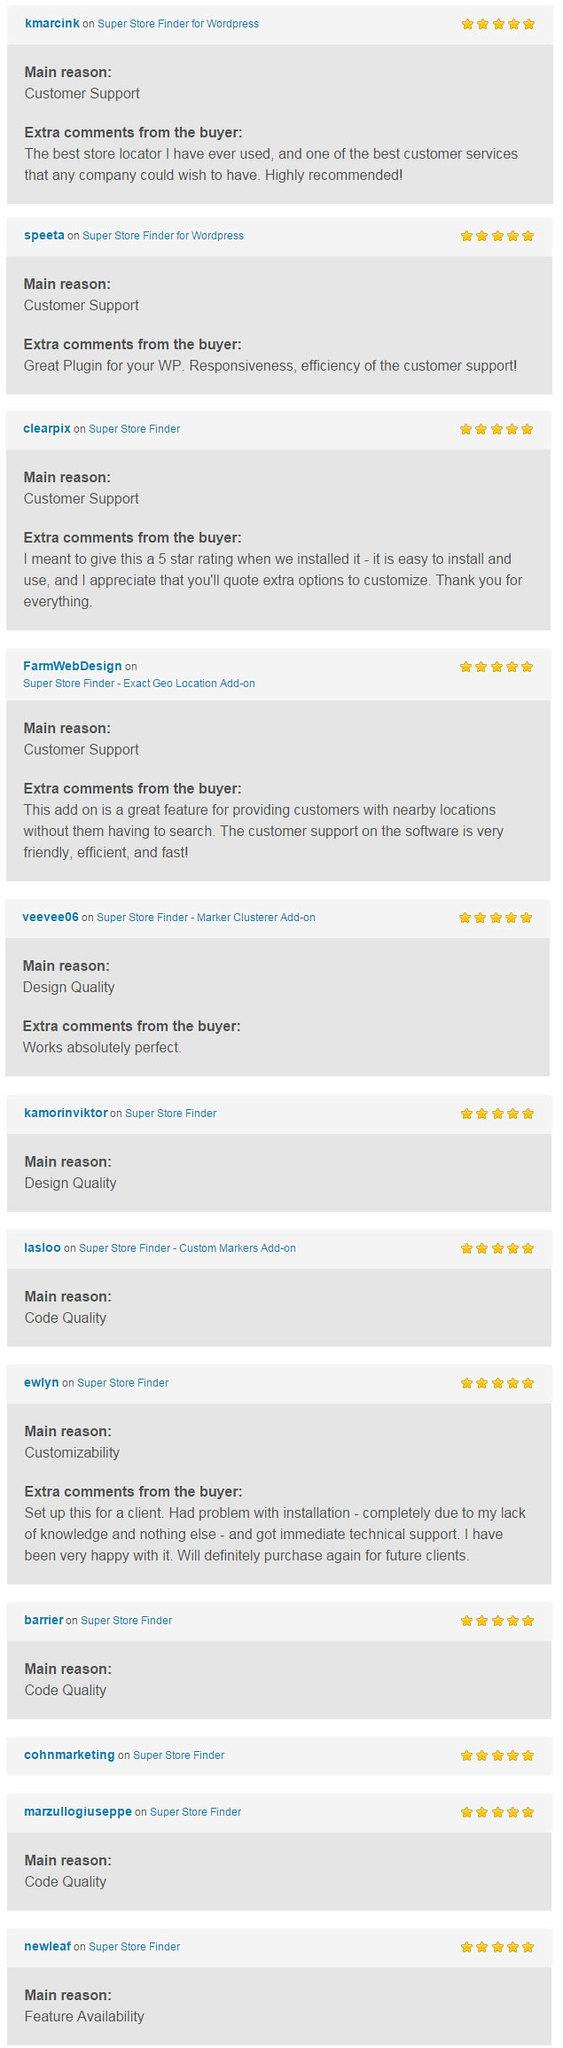 Marker Clusterer Add-on for WordPress - 3